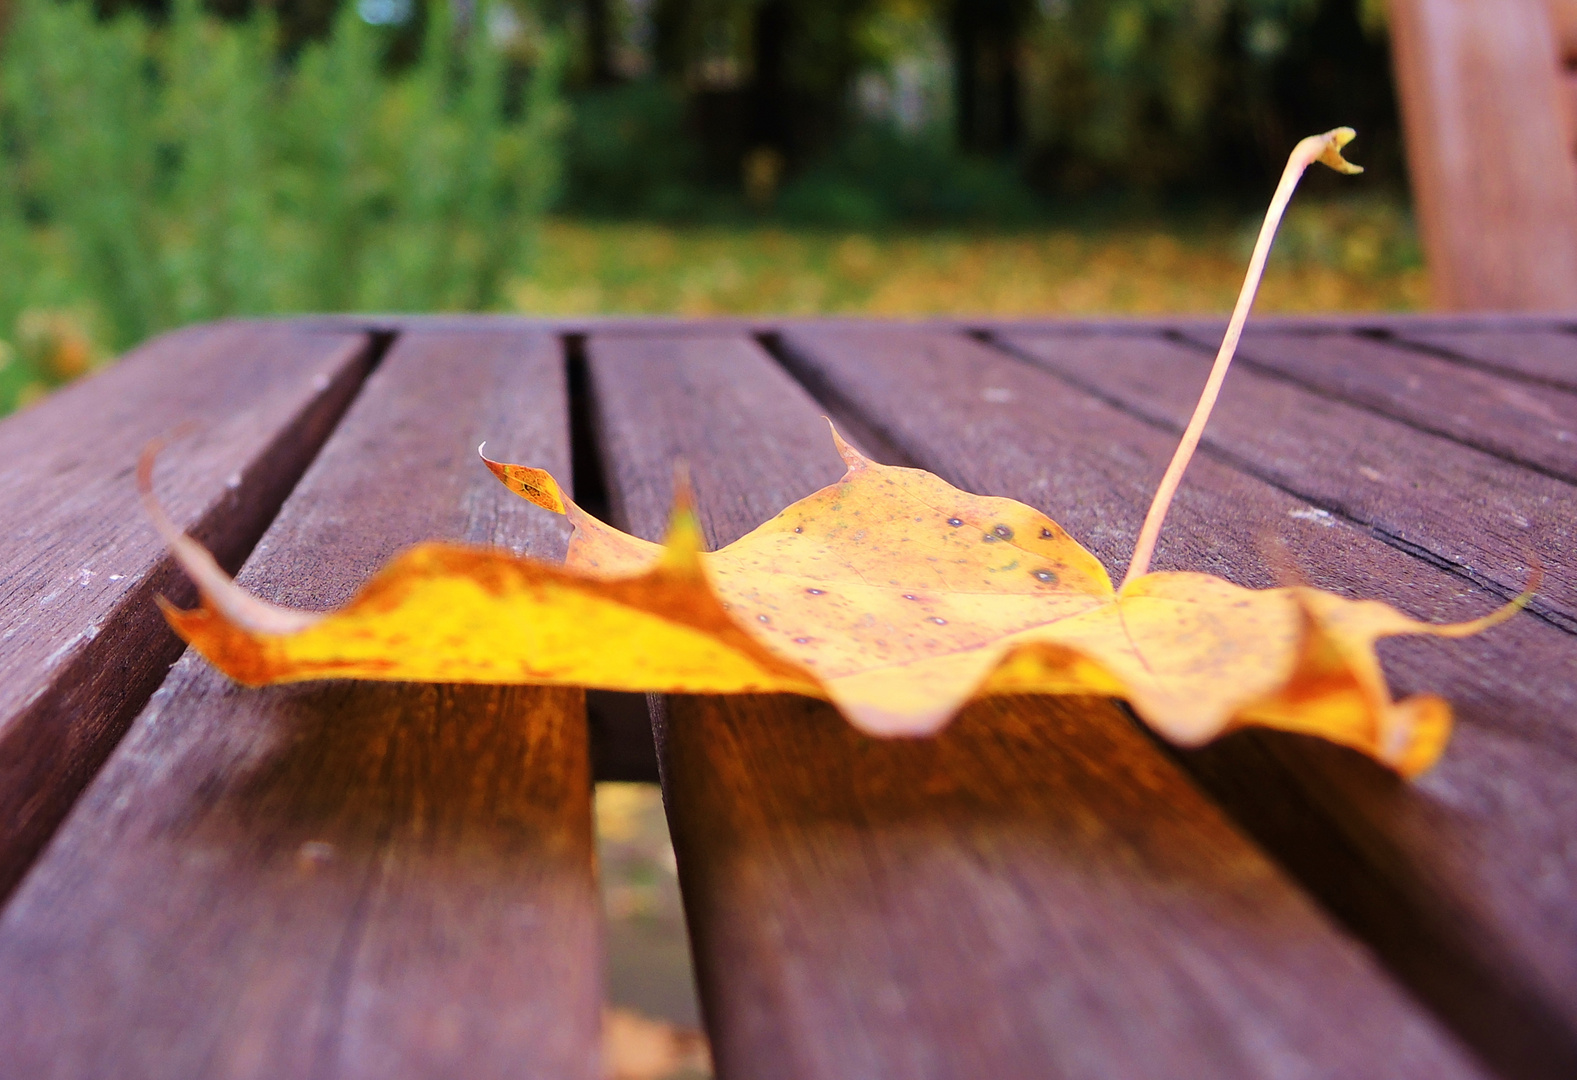 Herbst - 2. Versuch